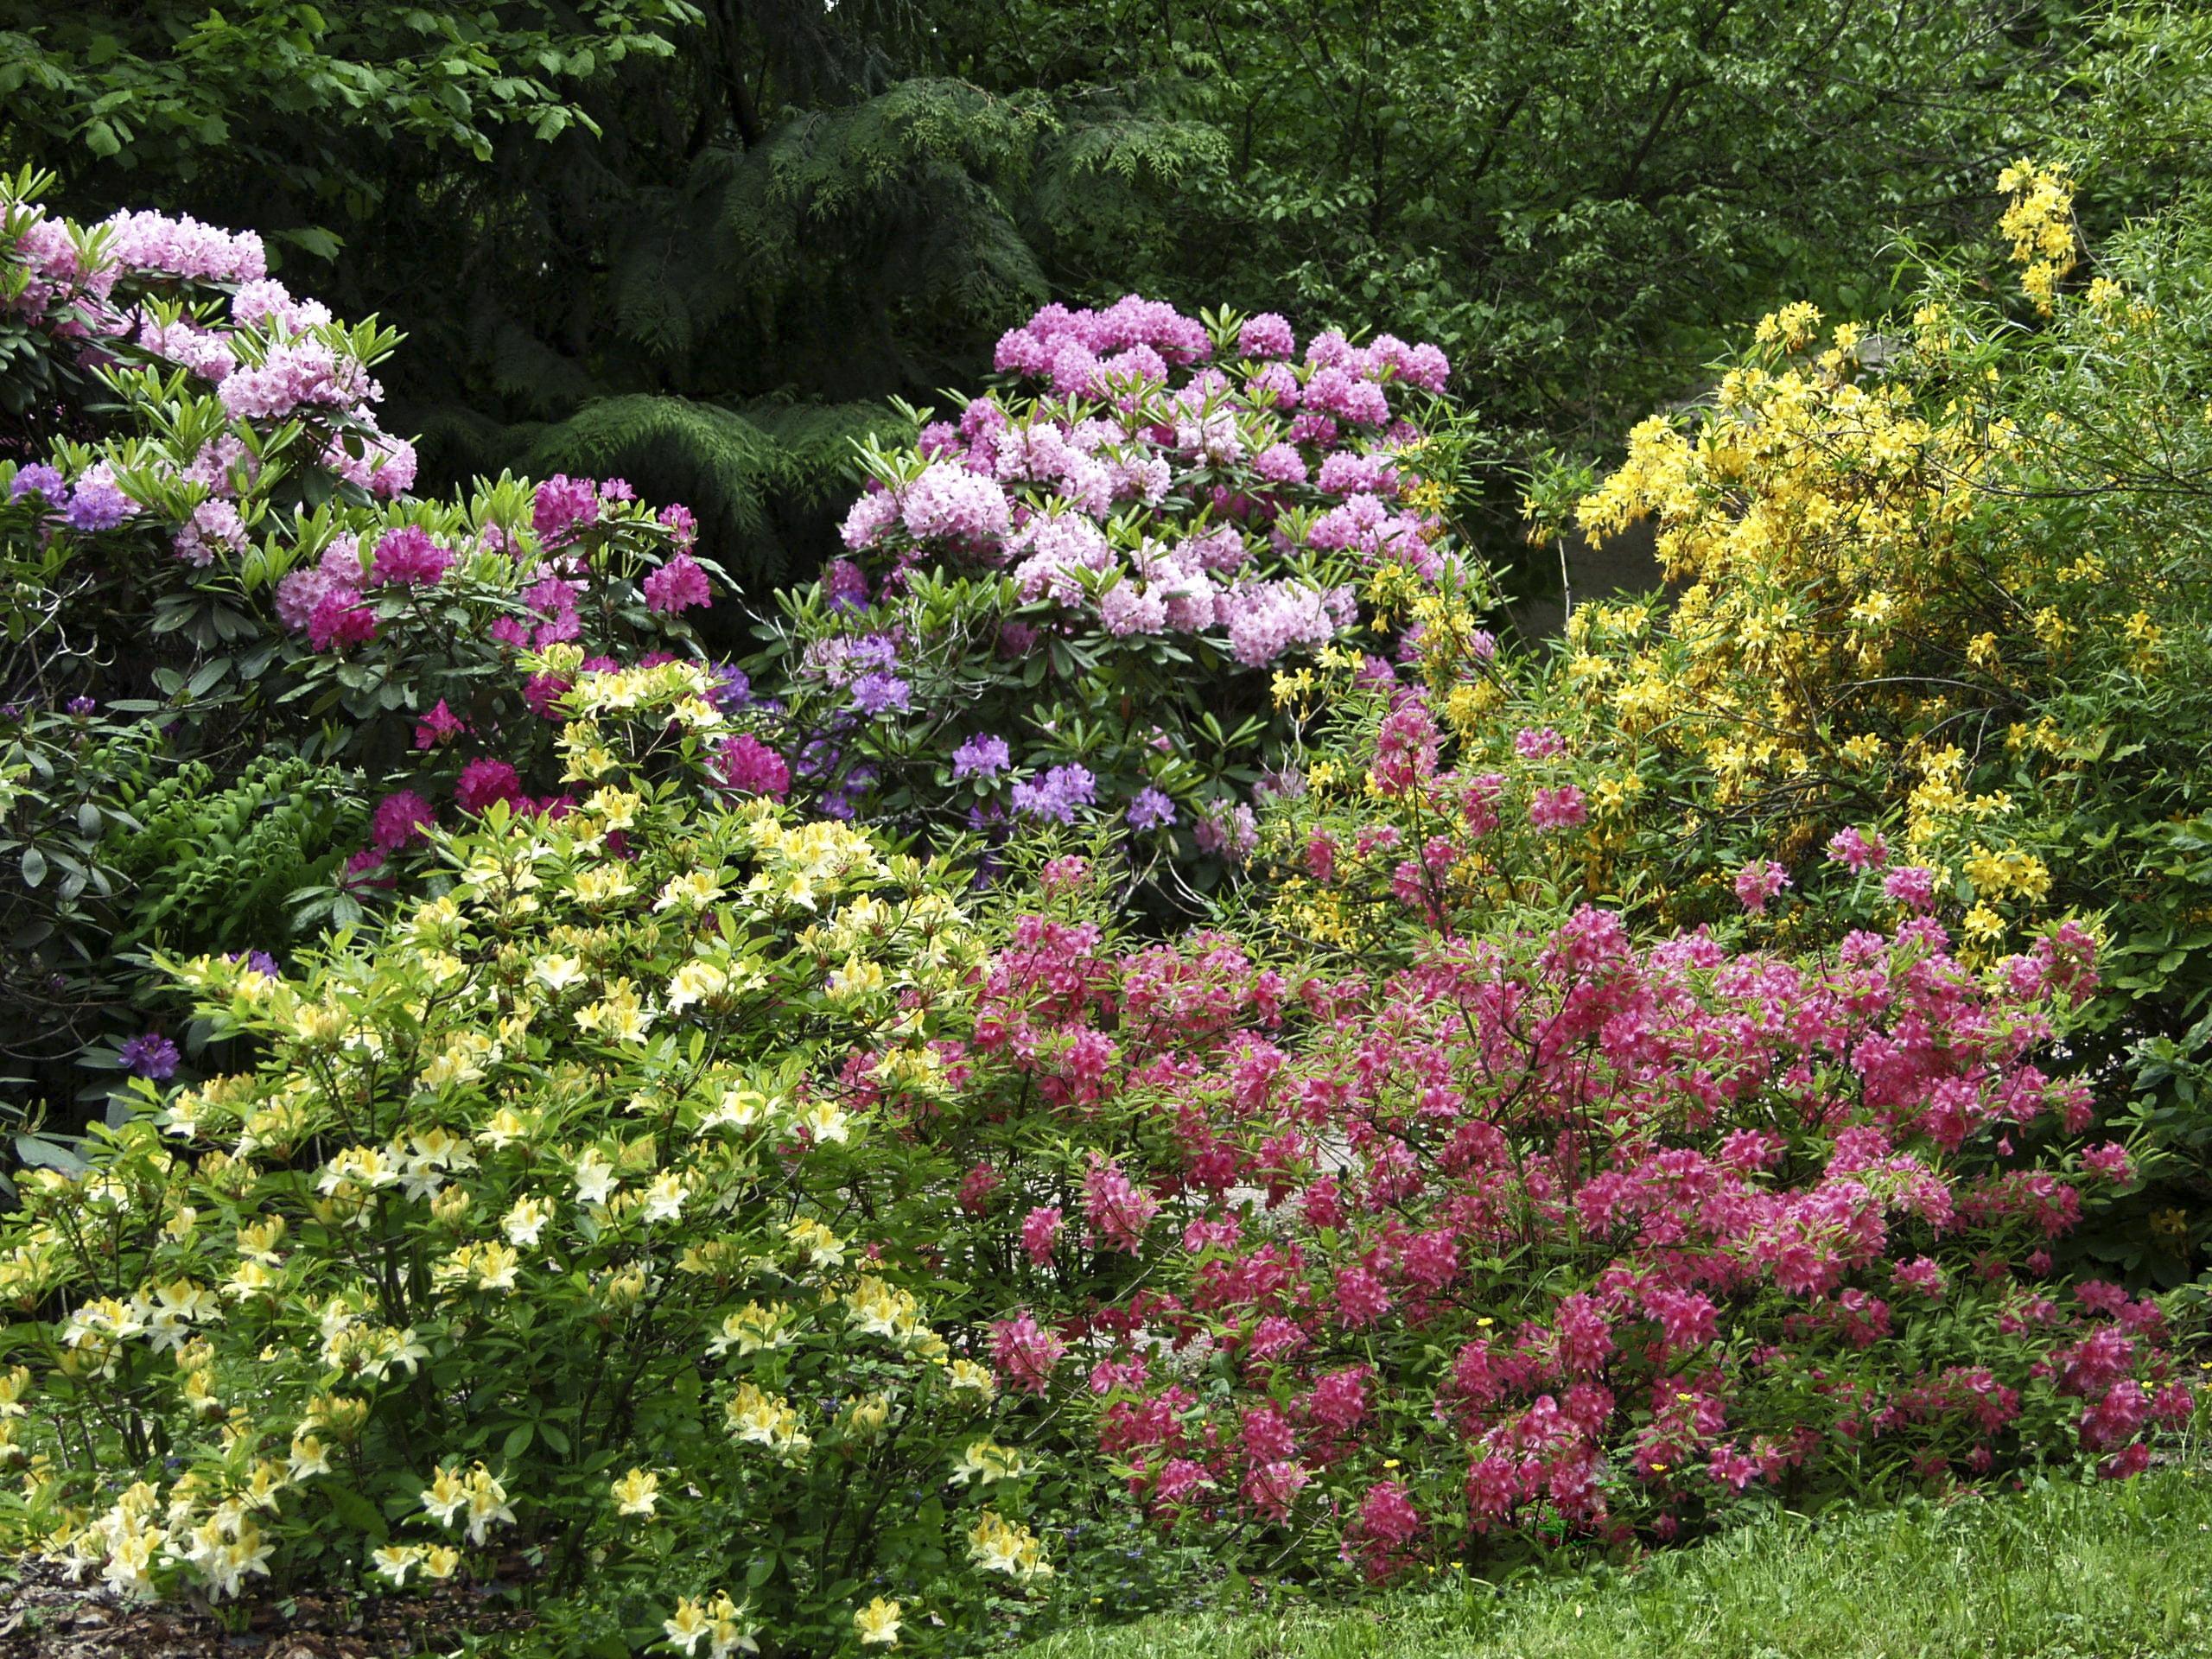 Kukat kevyet kuin perhoset